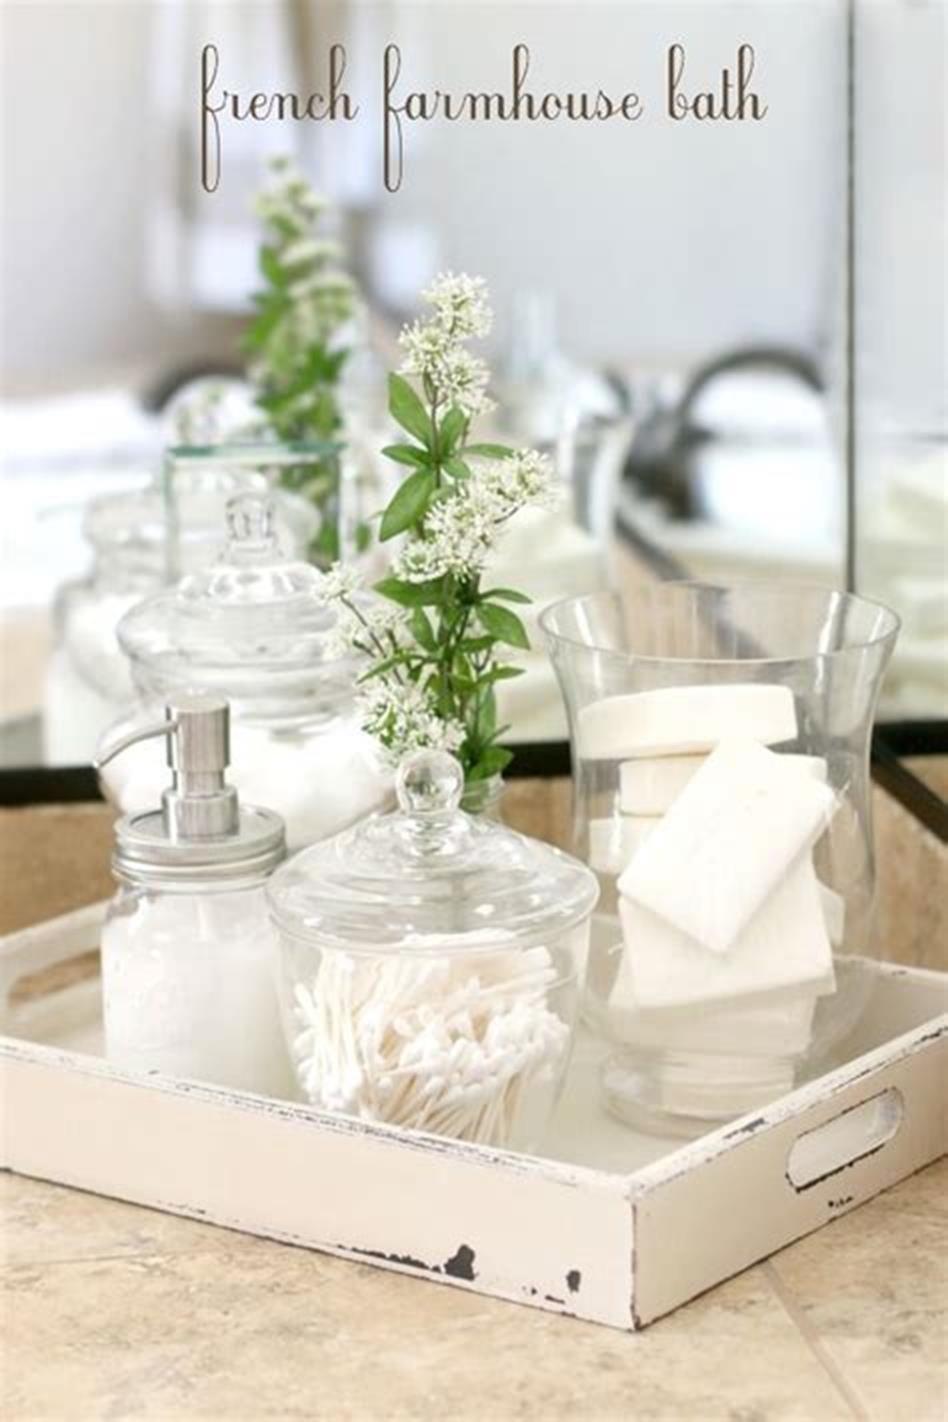 40+ Beautiful Farmhouse Style Tray Decor Ideas #bathroomvanitydecor